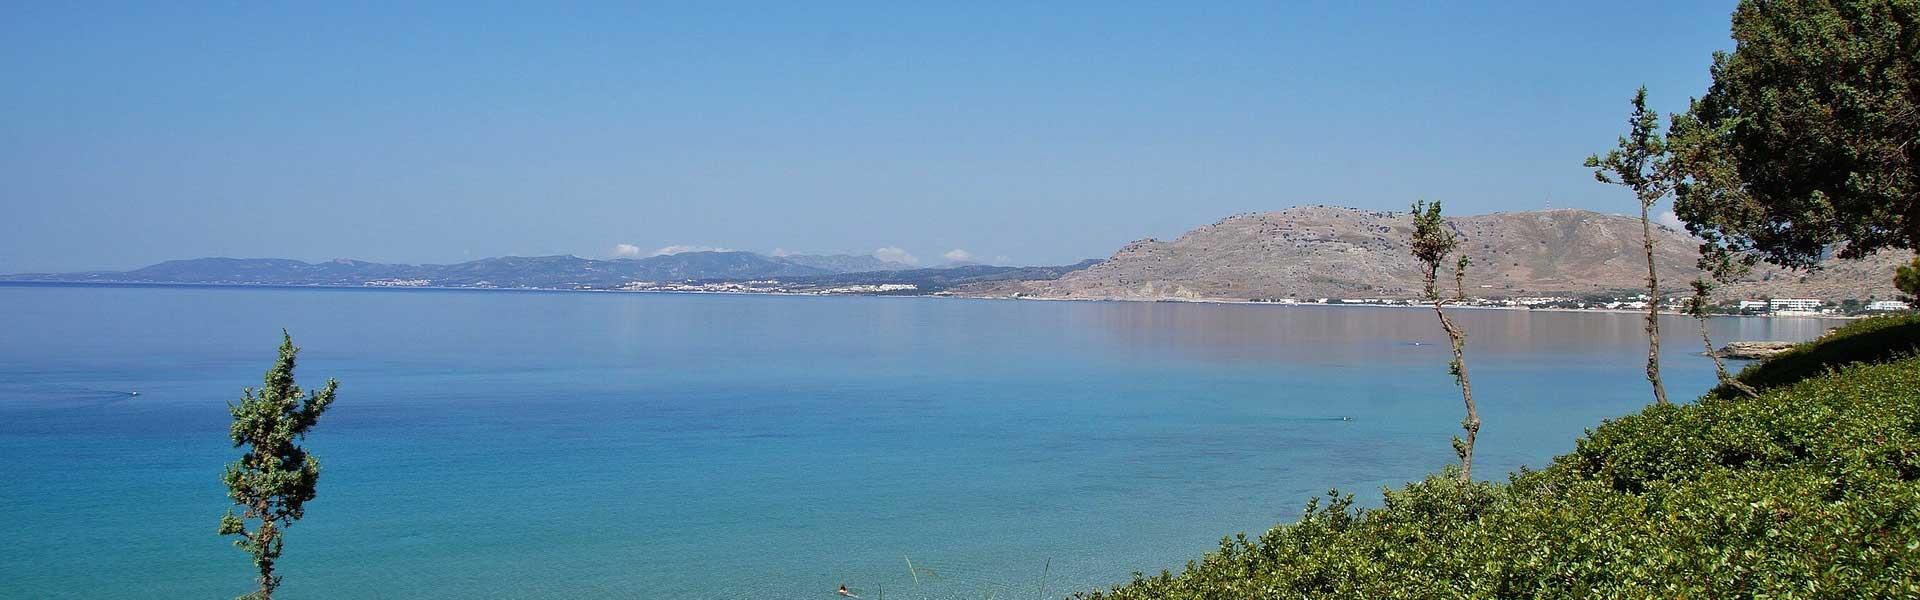 Best Pefkos Restaurants - View of Pefkos coastline